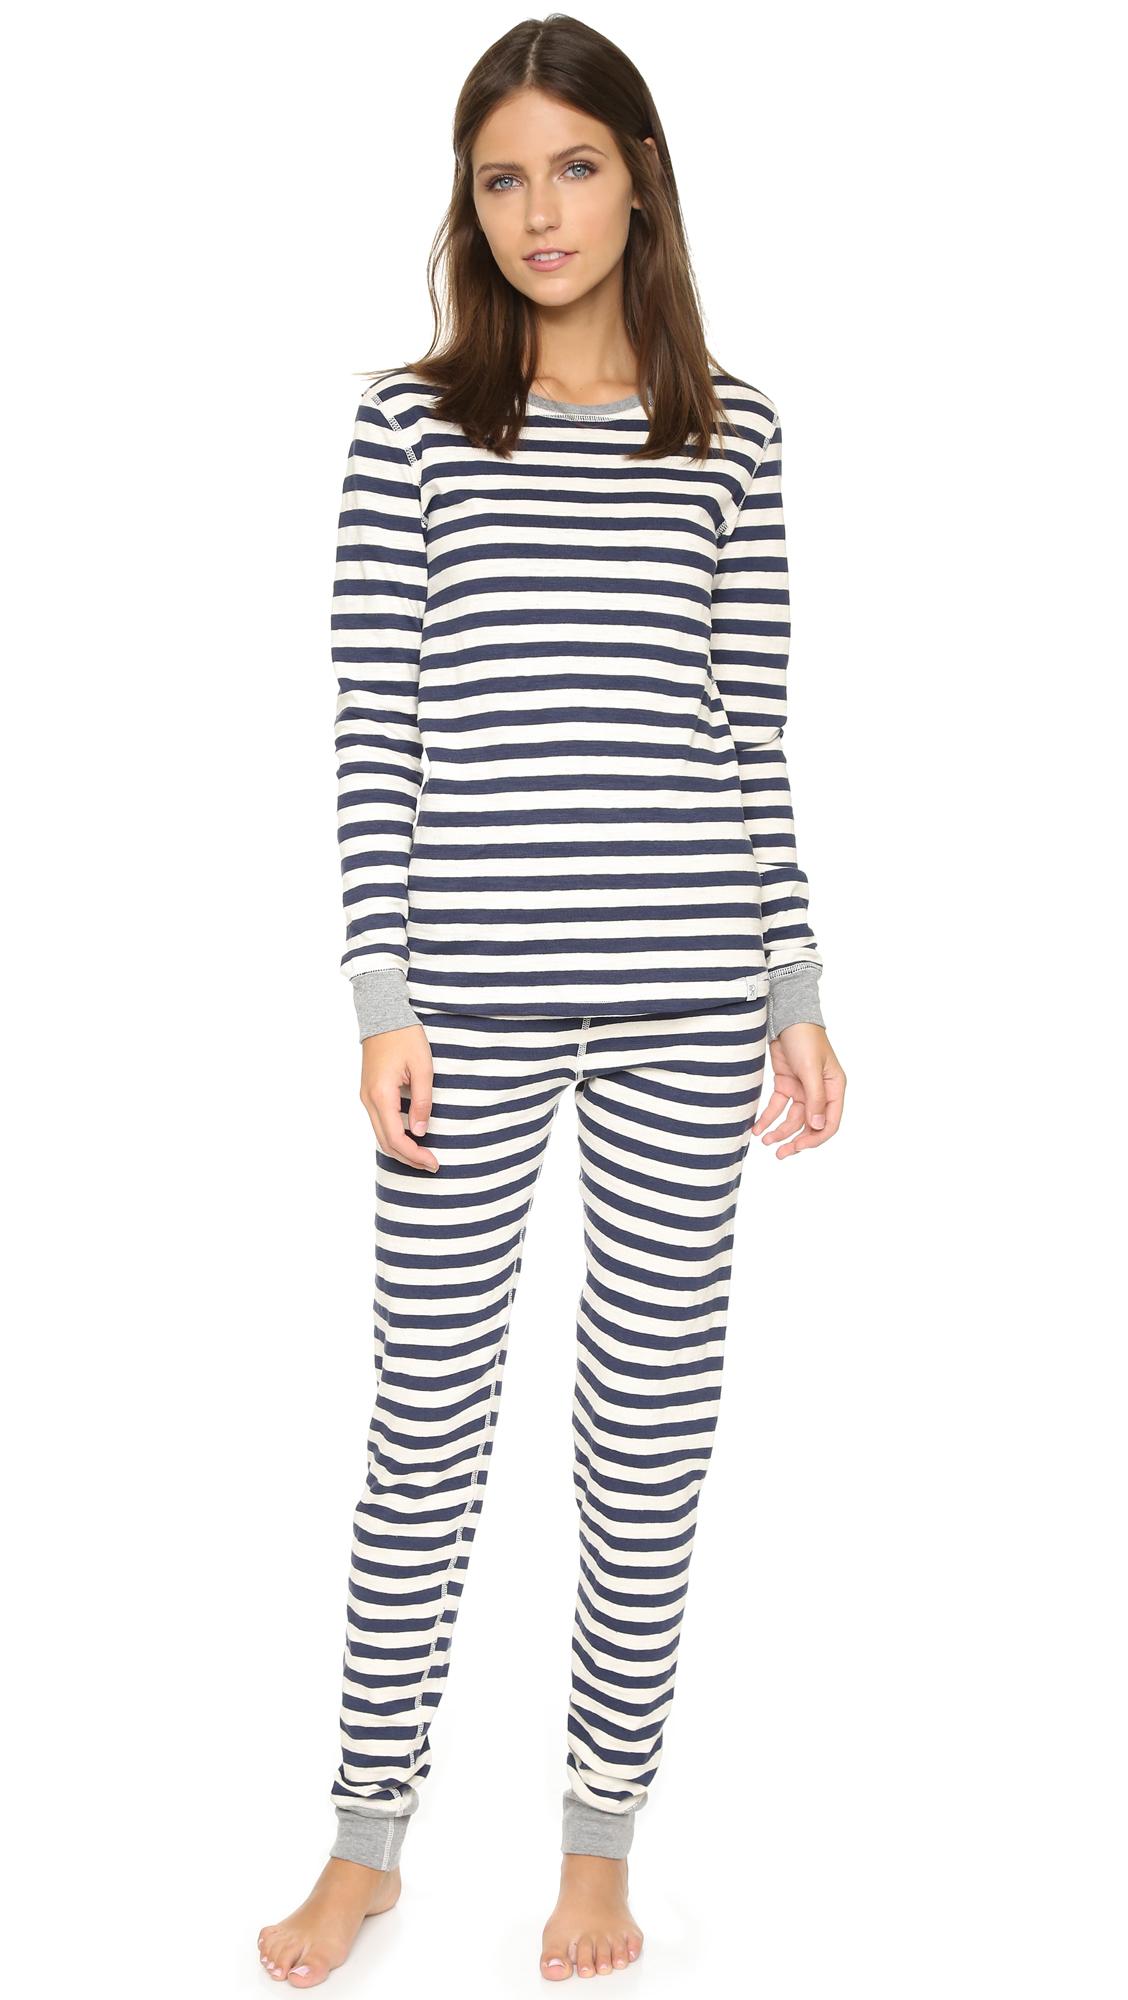 2de54be22f Lyst - Sleepy Jones Helen Pajama Shirt - Rugby Stripe Navy in Black